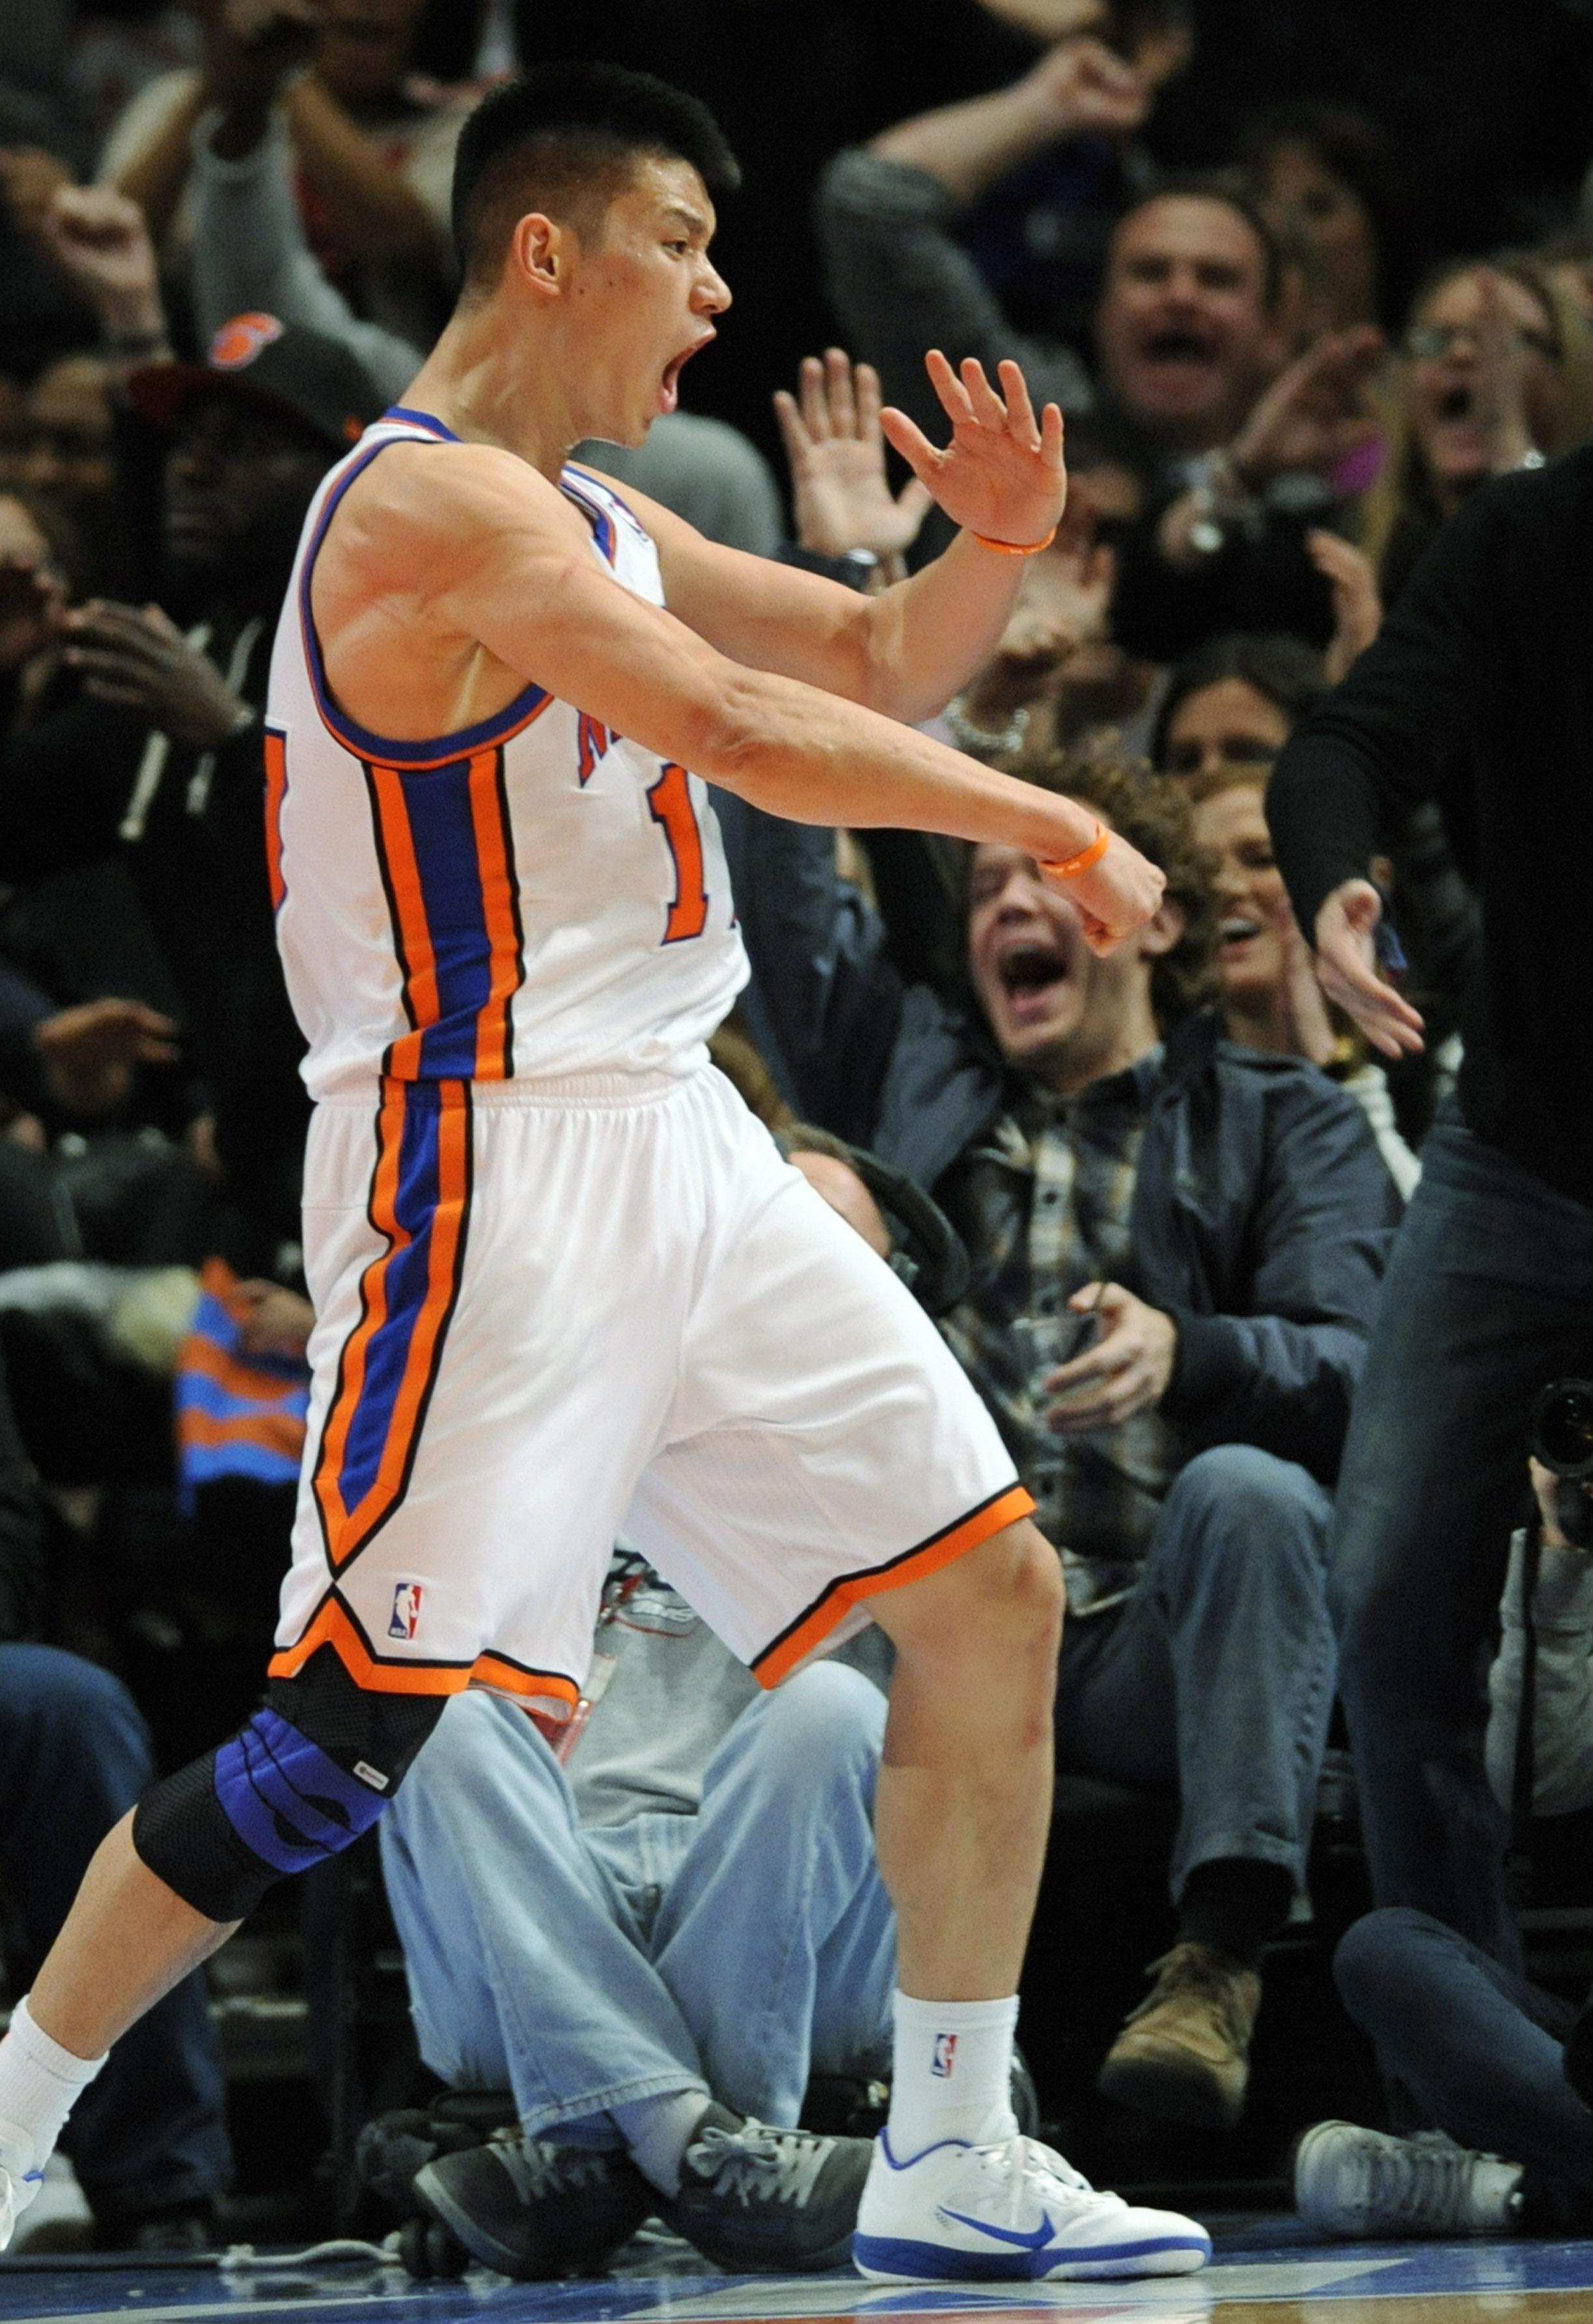 Jeremy Lin Receives Encouragement From Ex-Knicks Guard Wat Misaka, First Asian American in NBA